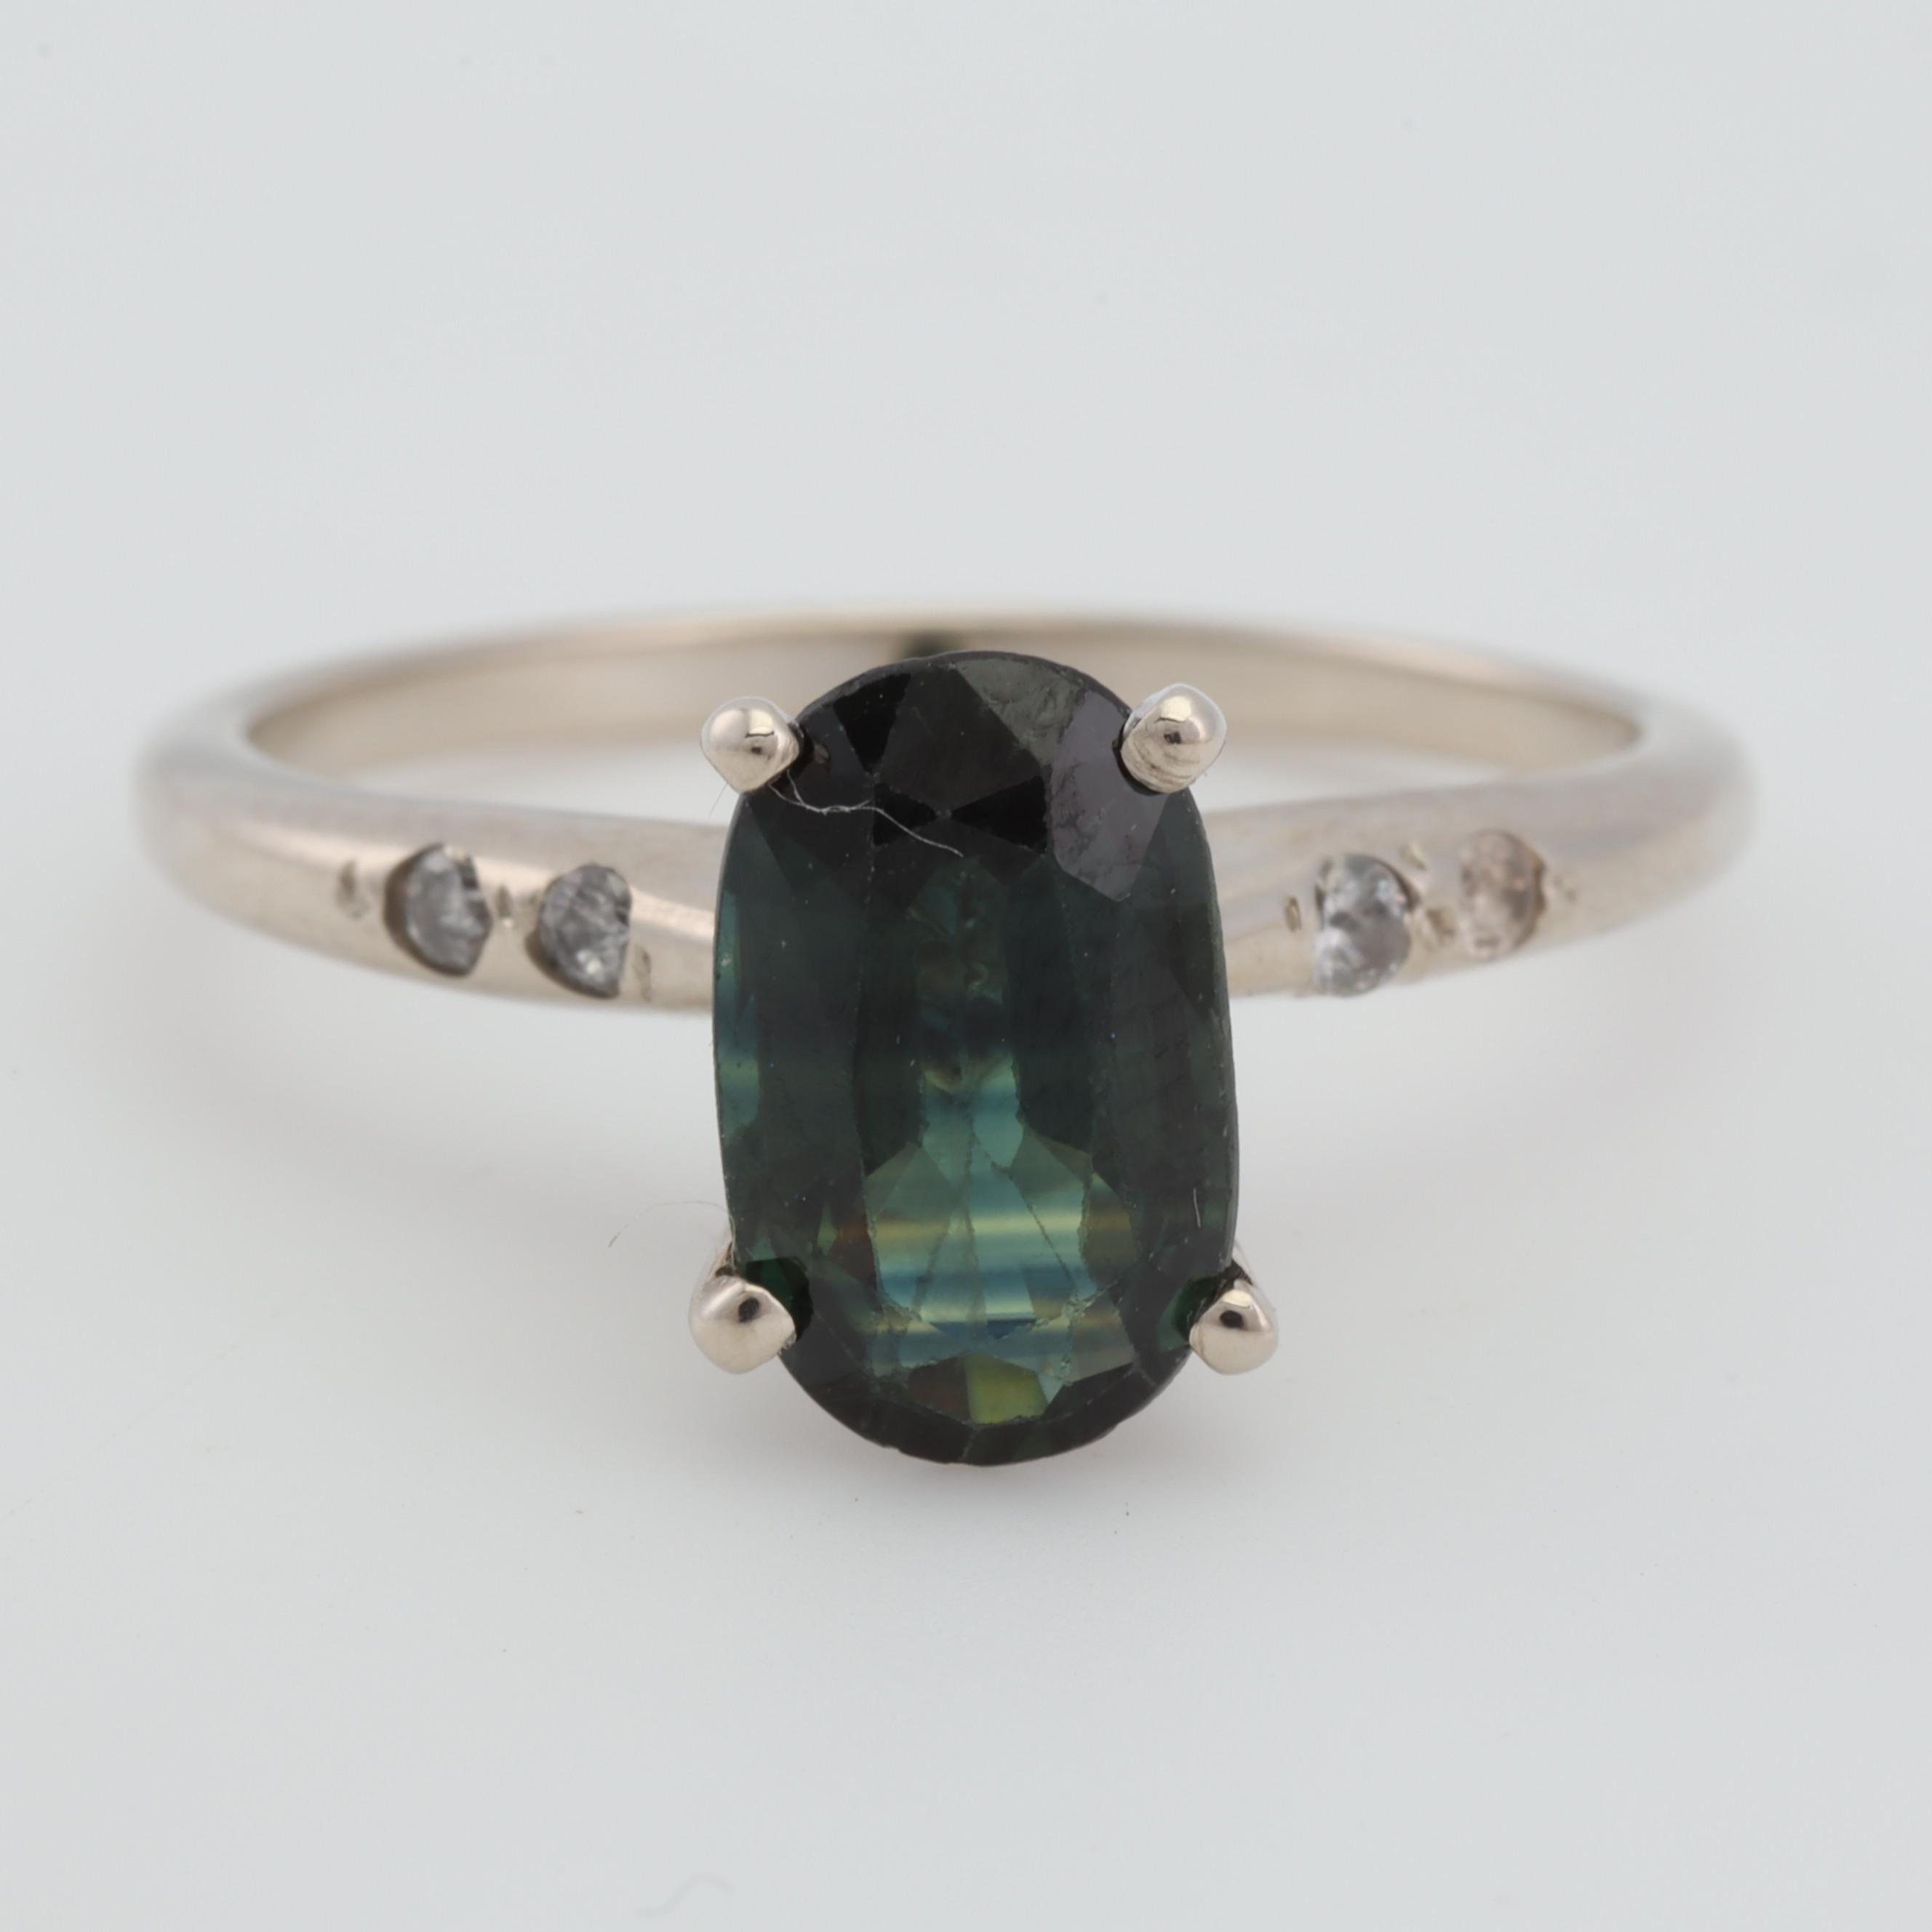 14K White Gold Green Sapphire and Diamond Ring, 1.58 CT Sapphire